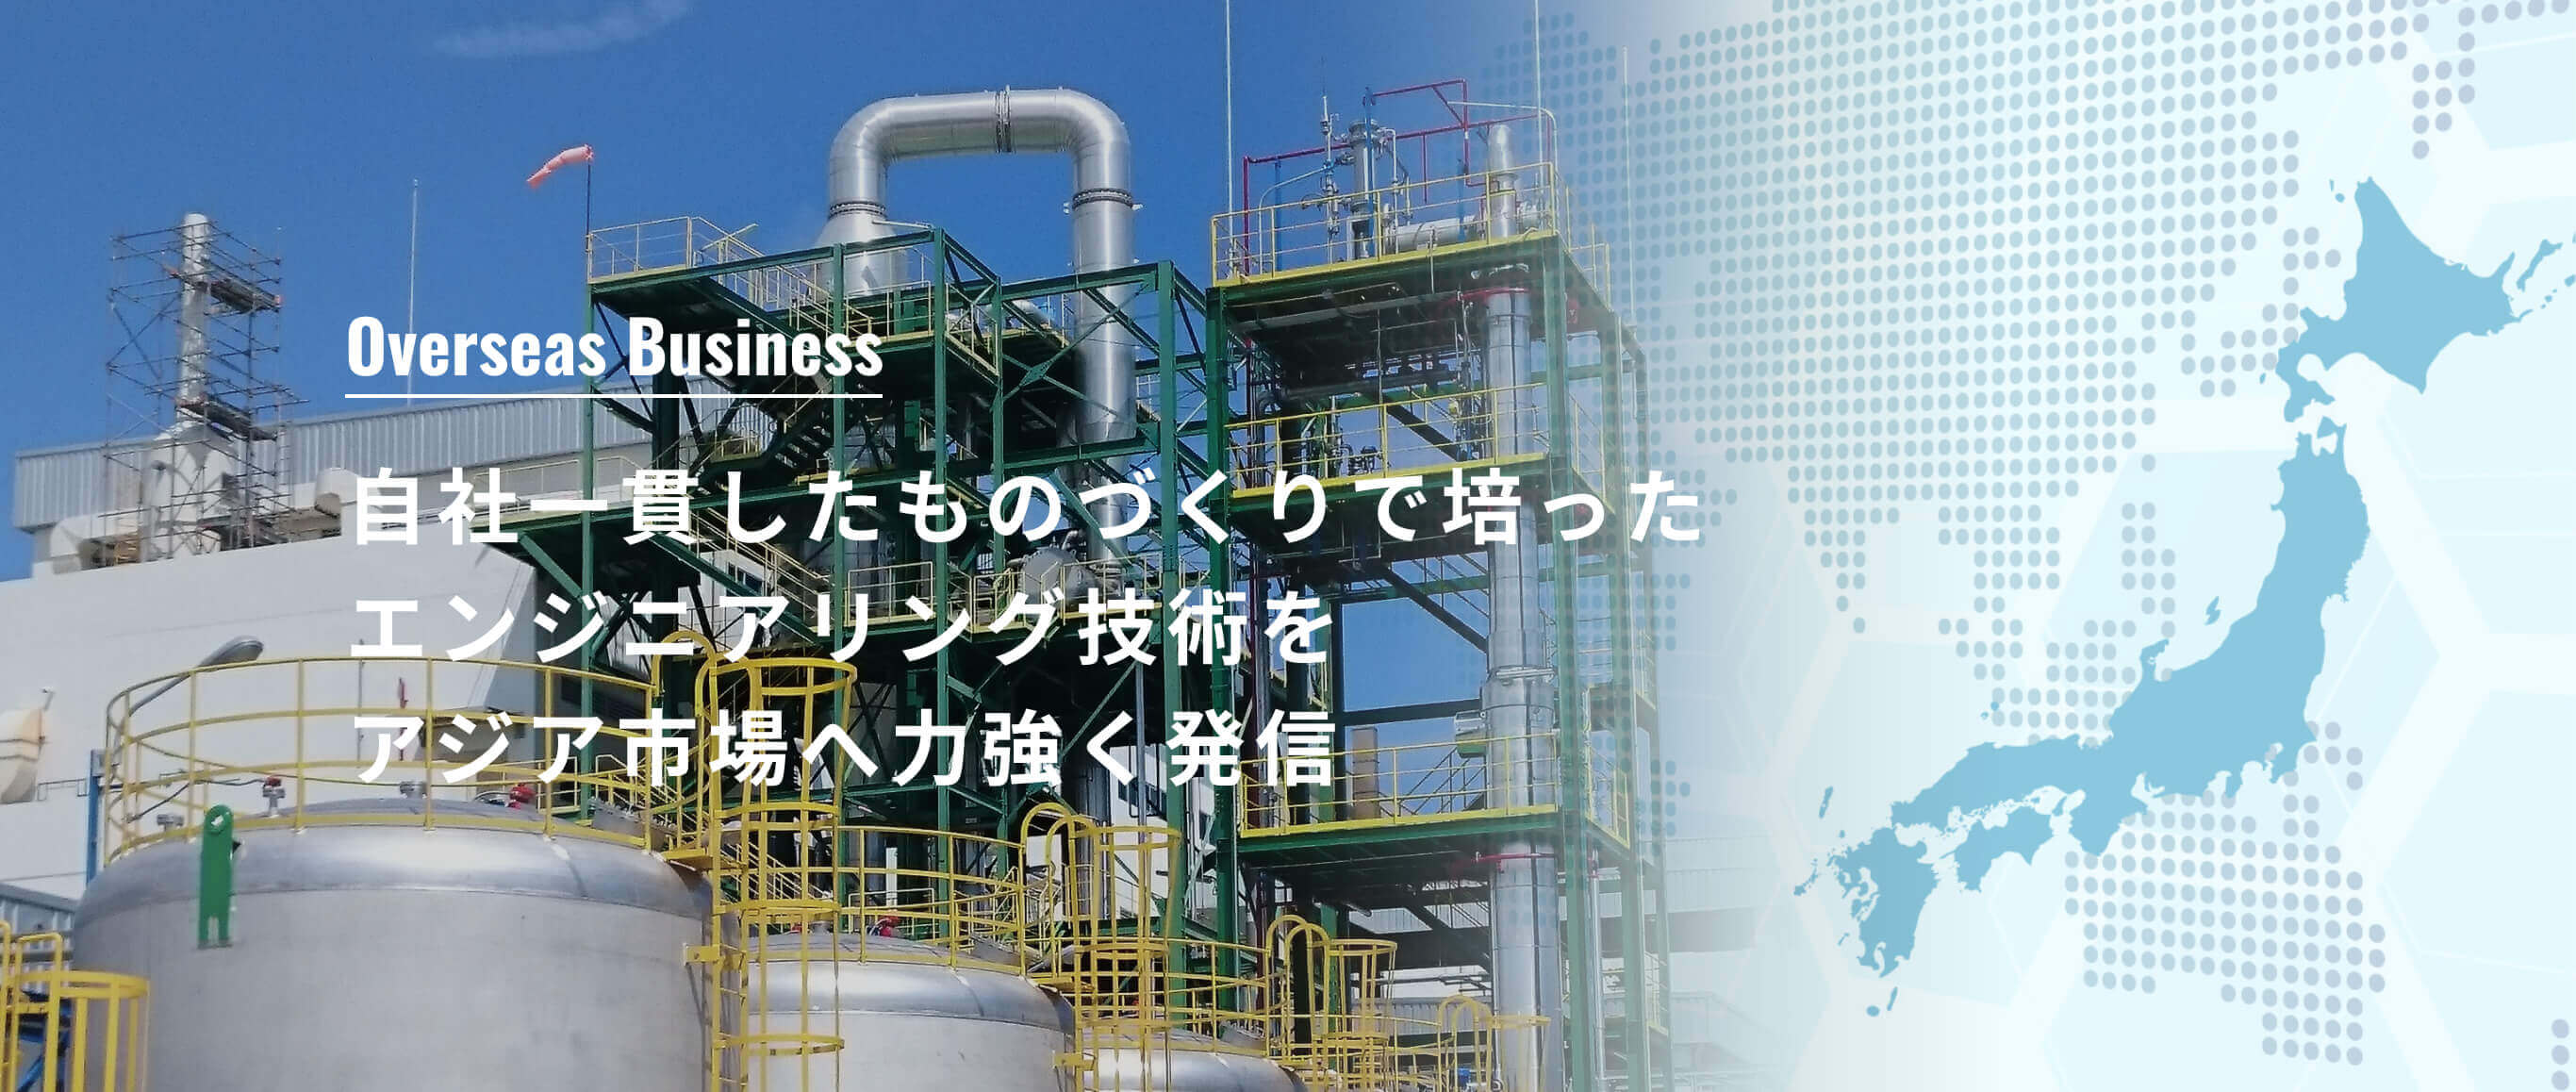 Overseas Business 自社一貫したものづくりで培ったエンジニアリング技術をアジア市場へ力強く発信